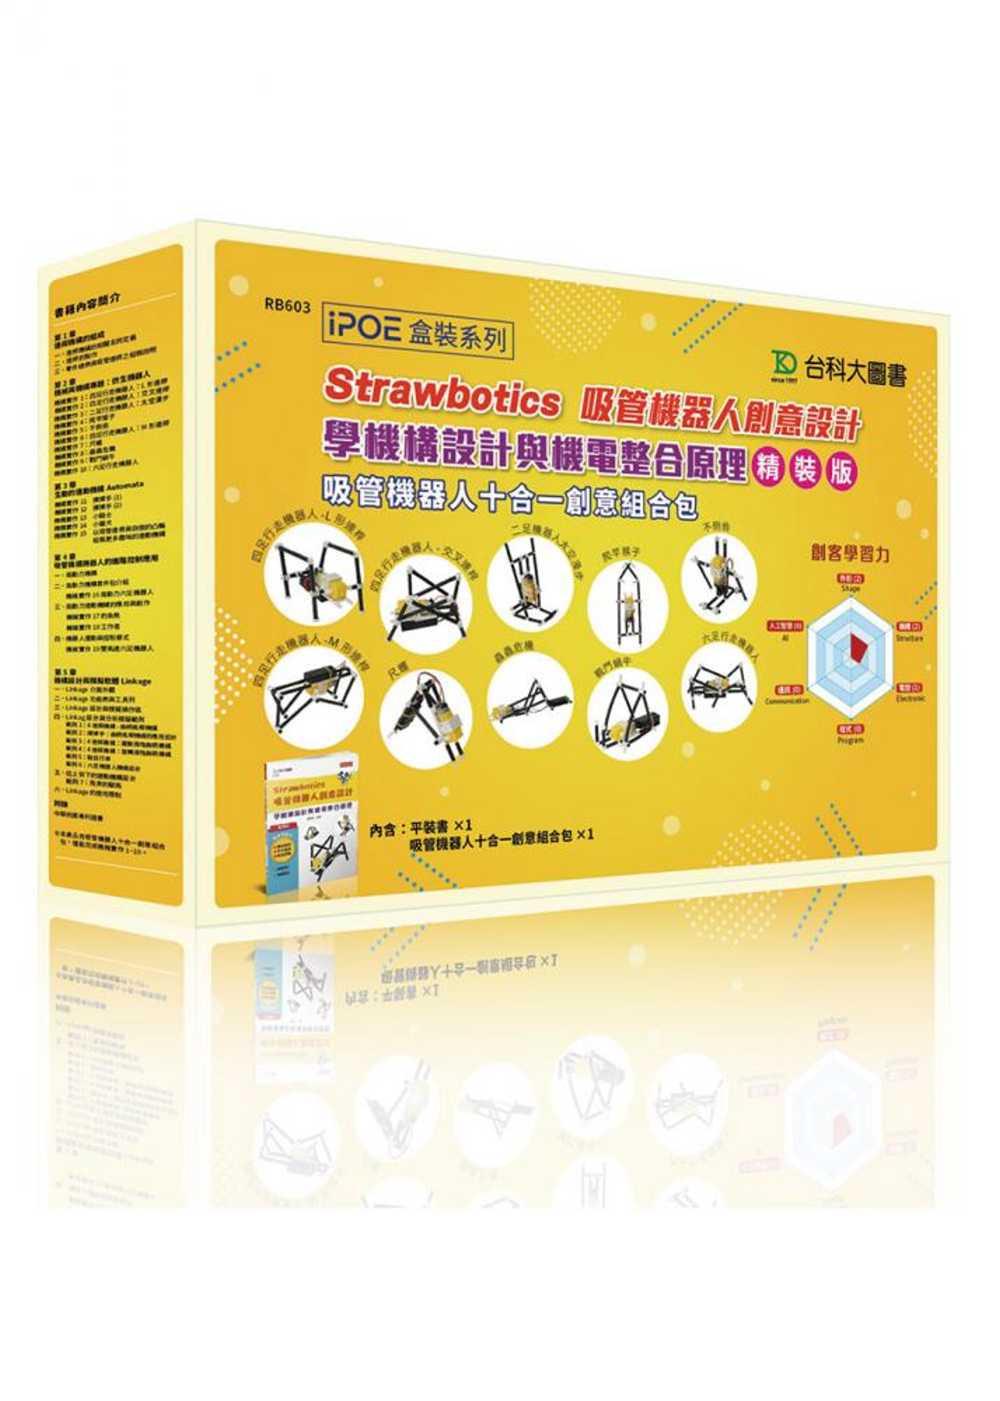 Strawbotics吸管機器人創意設計:學機構設計與機電整合原理(精裝版)吸管機器人十合一創意組合包